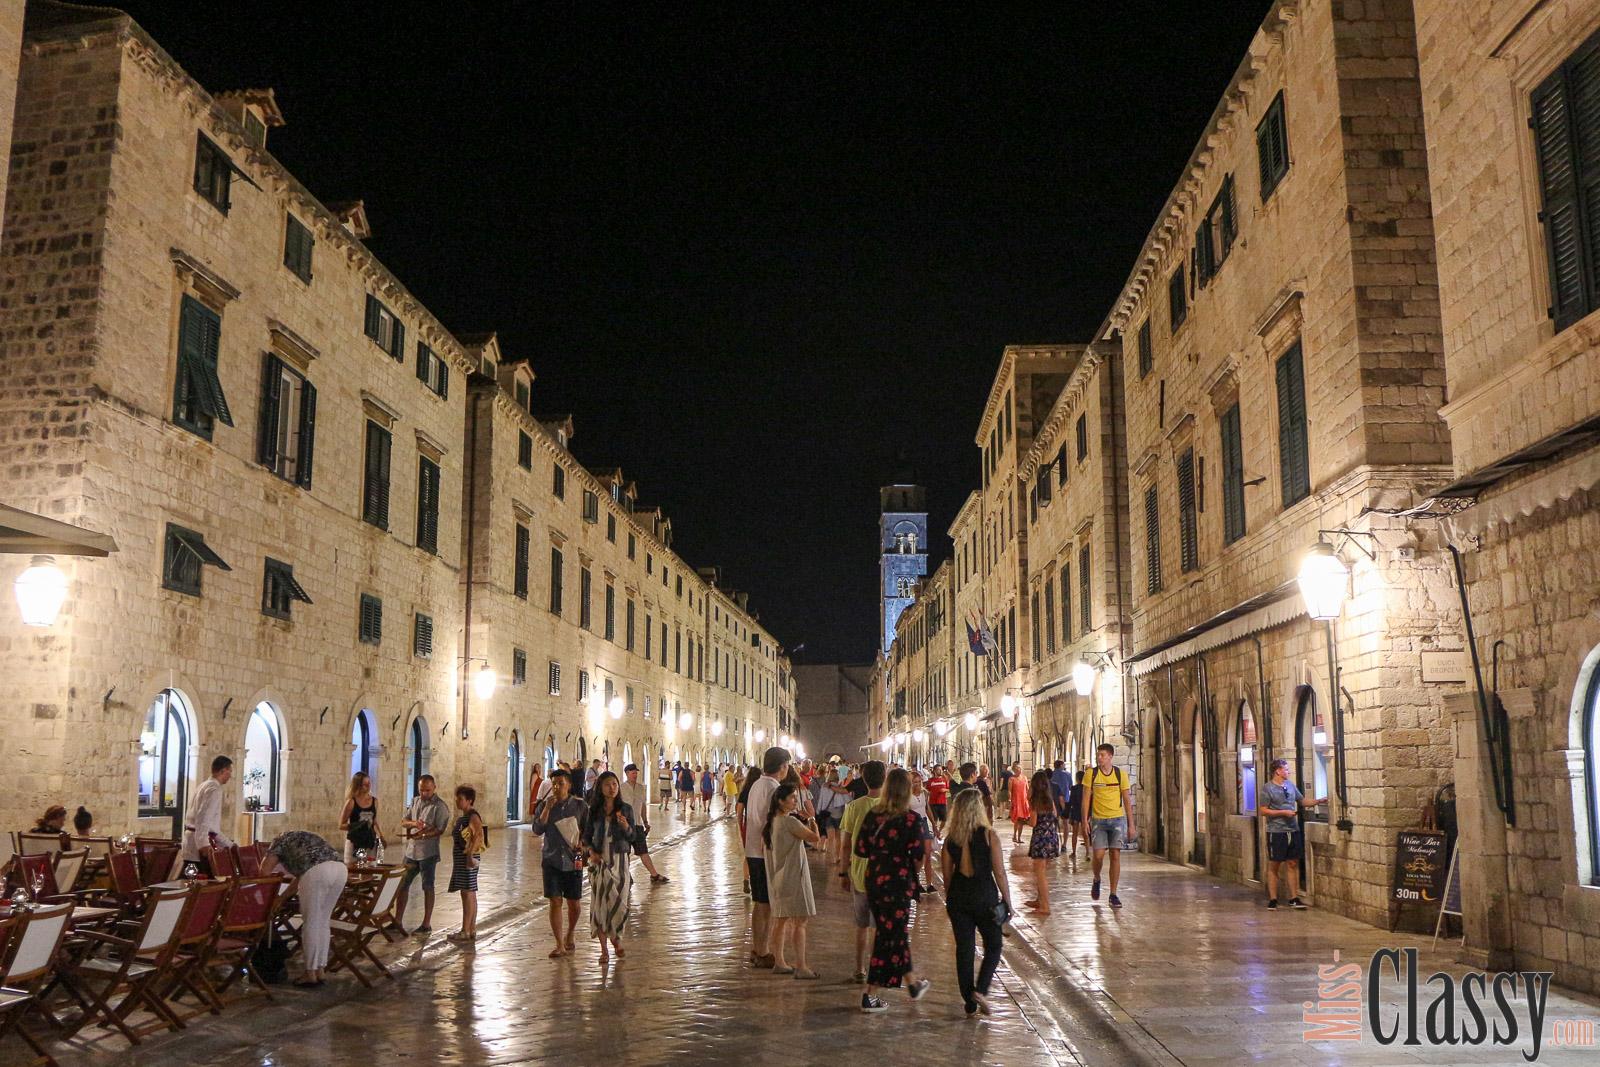 TRAVEL Dubrovnik, Miss Classy, miss-classy.com, Lifestyleblog, Lifestyleblogger, Lifestyleblog Graz, Travelblog, Travelblogger, Graz, Steiermark, Österreich, classy, beclassy, Reise, Travel, Wanderlust, Wayfarer, Kroatien, Dubrovnik, Stadtmauer, Game of Thrones, Mlini, Altstadt Dubrovnik, Hafen Dubrovnik, Dubrovnik bei Nacht